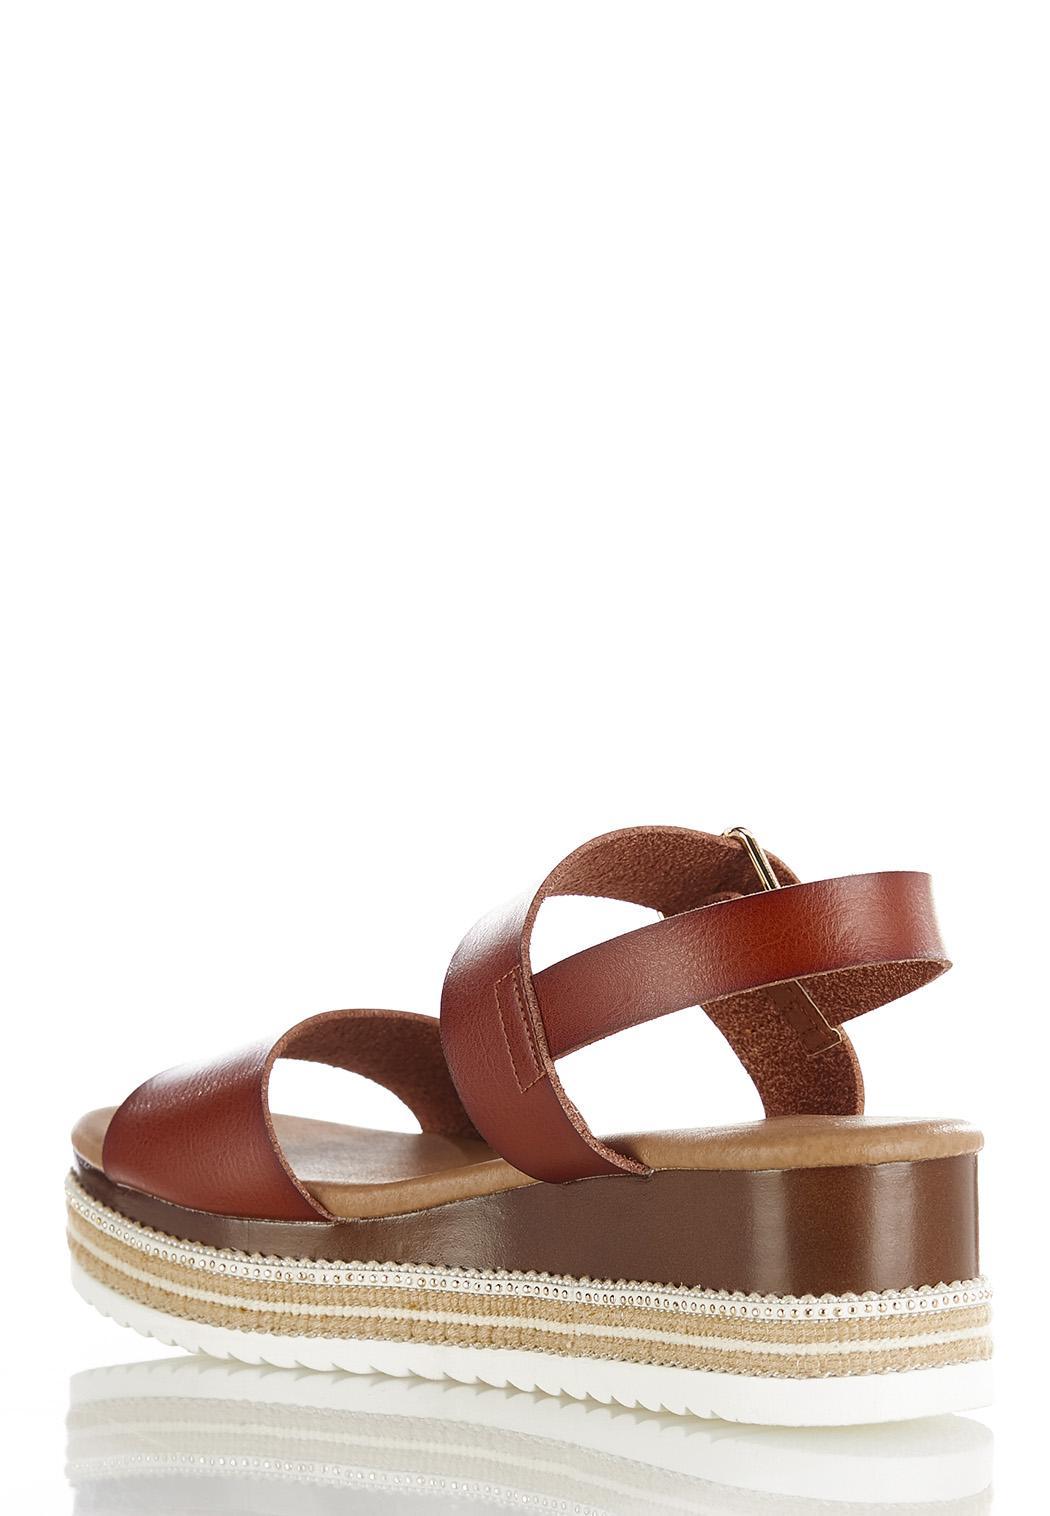 Cognac Flatform Wedge Sandals (Item #44487912)